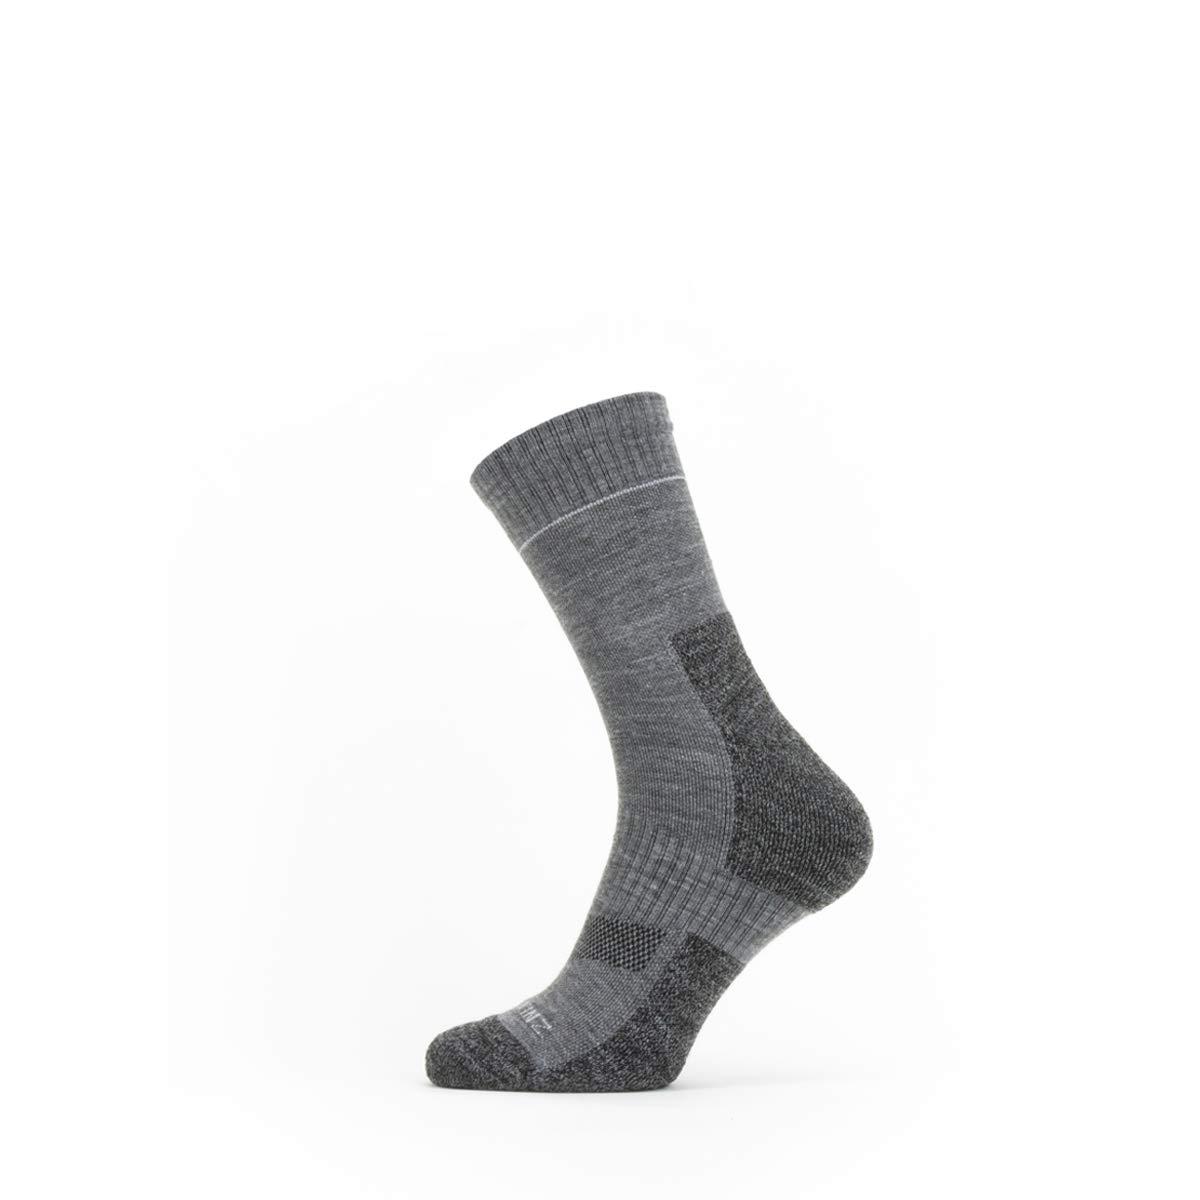 SealSkinz Herren Solo Quickdry Ankle Length Socke